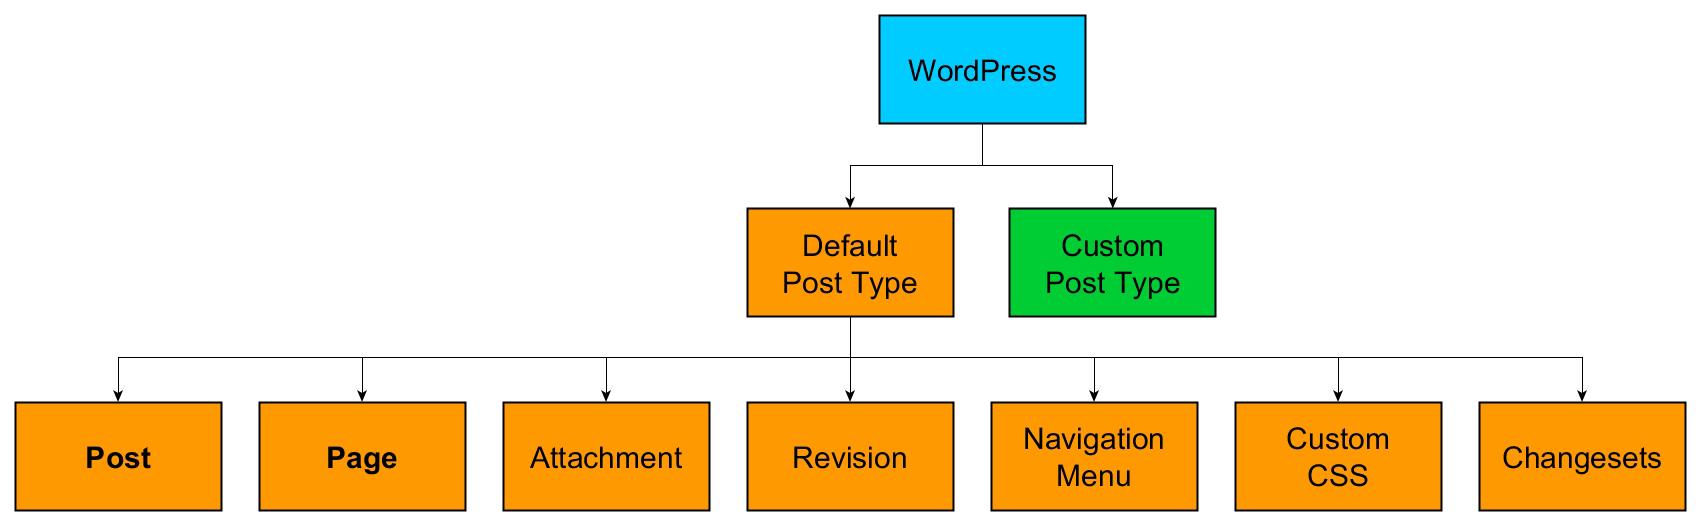 WordPress lets you create custom post types